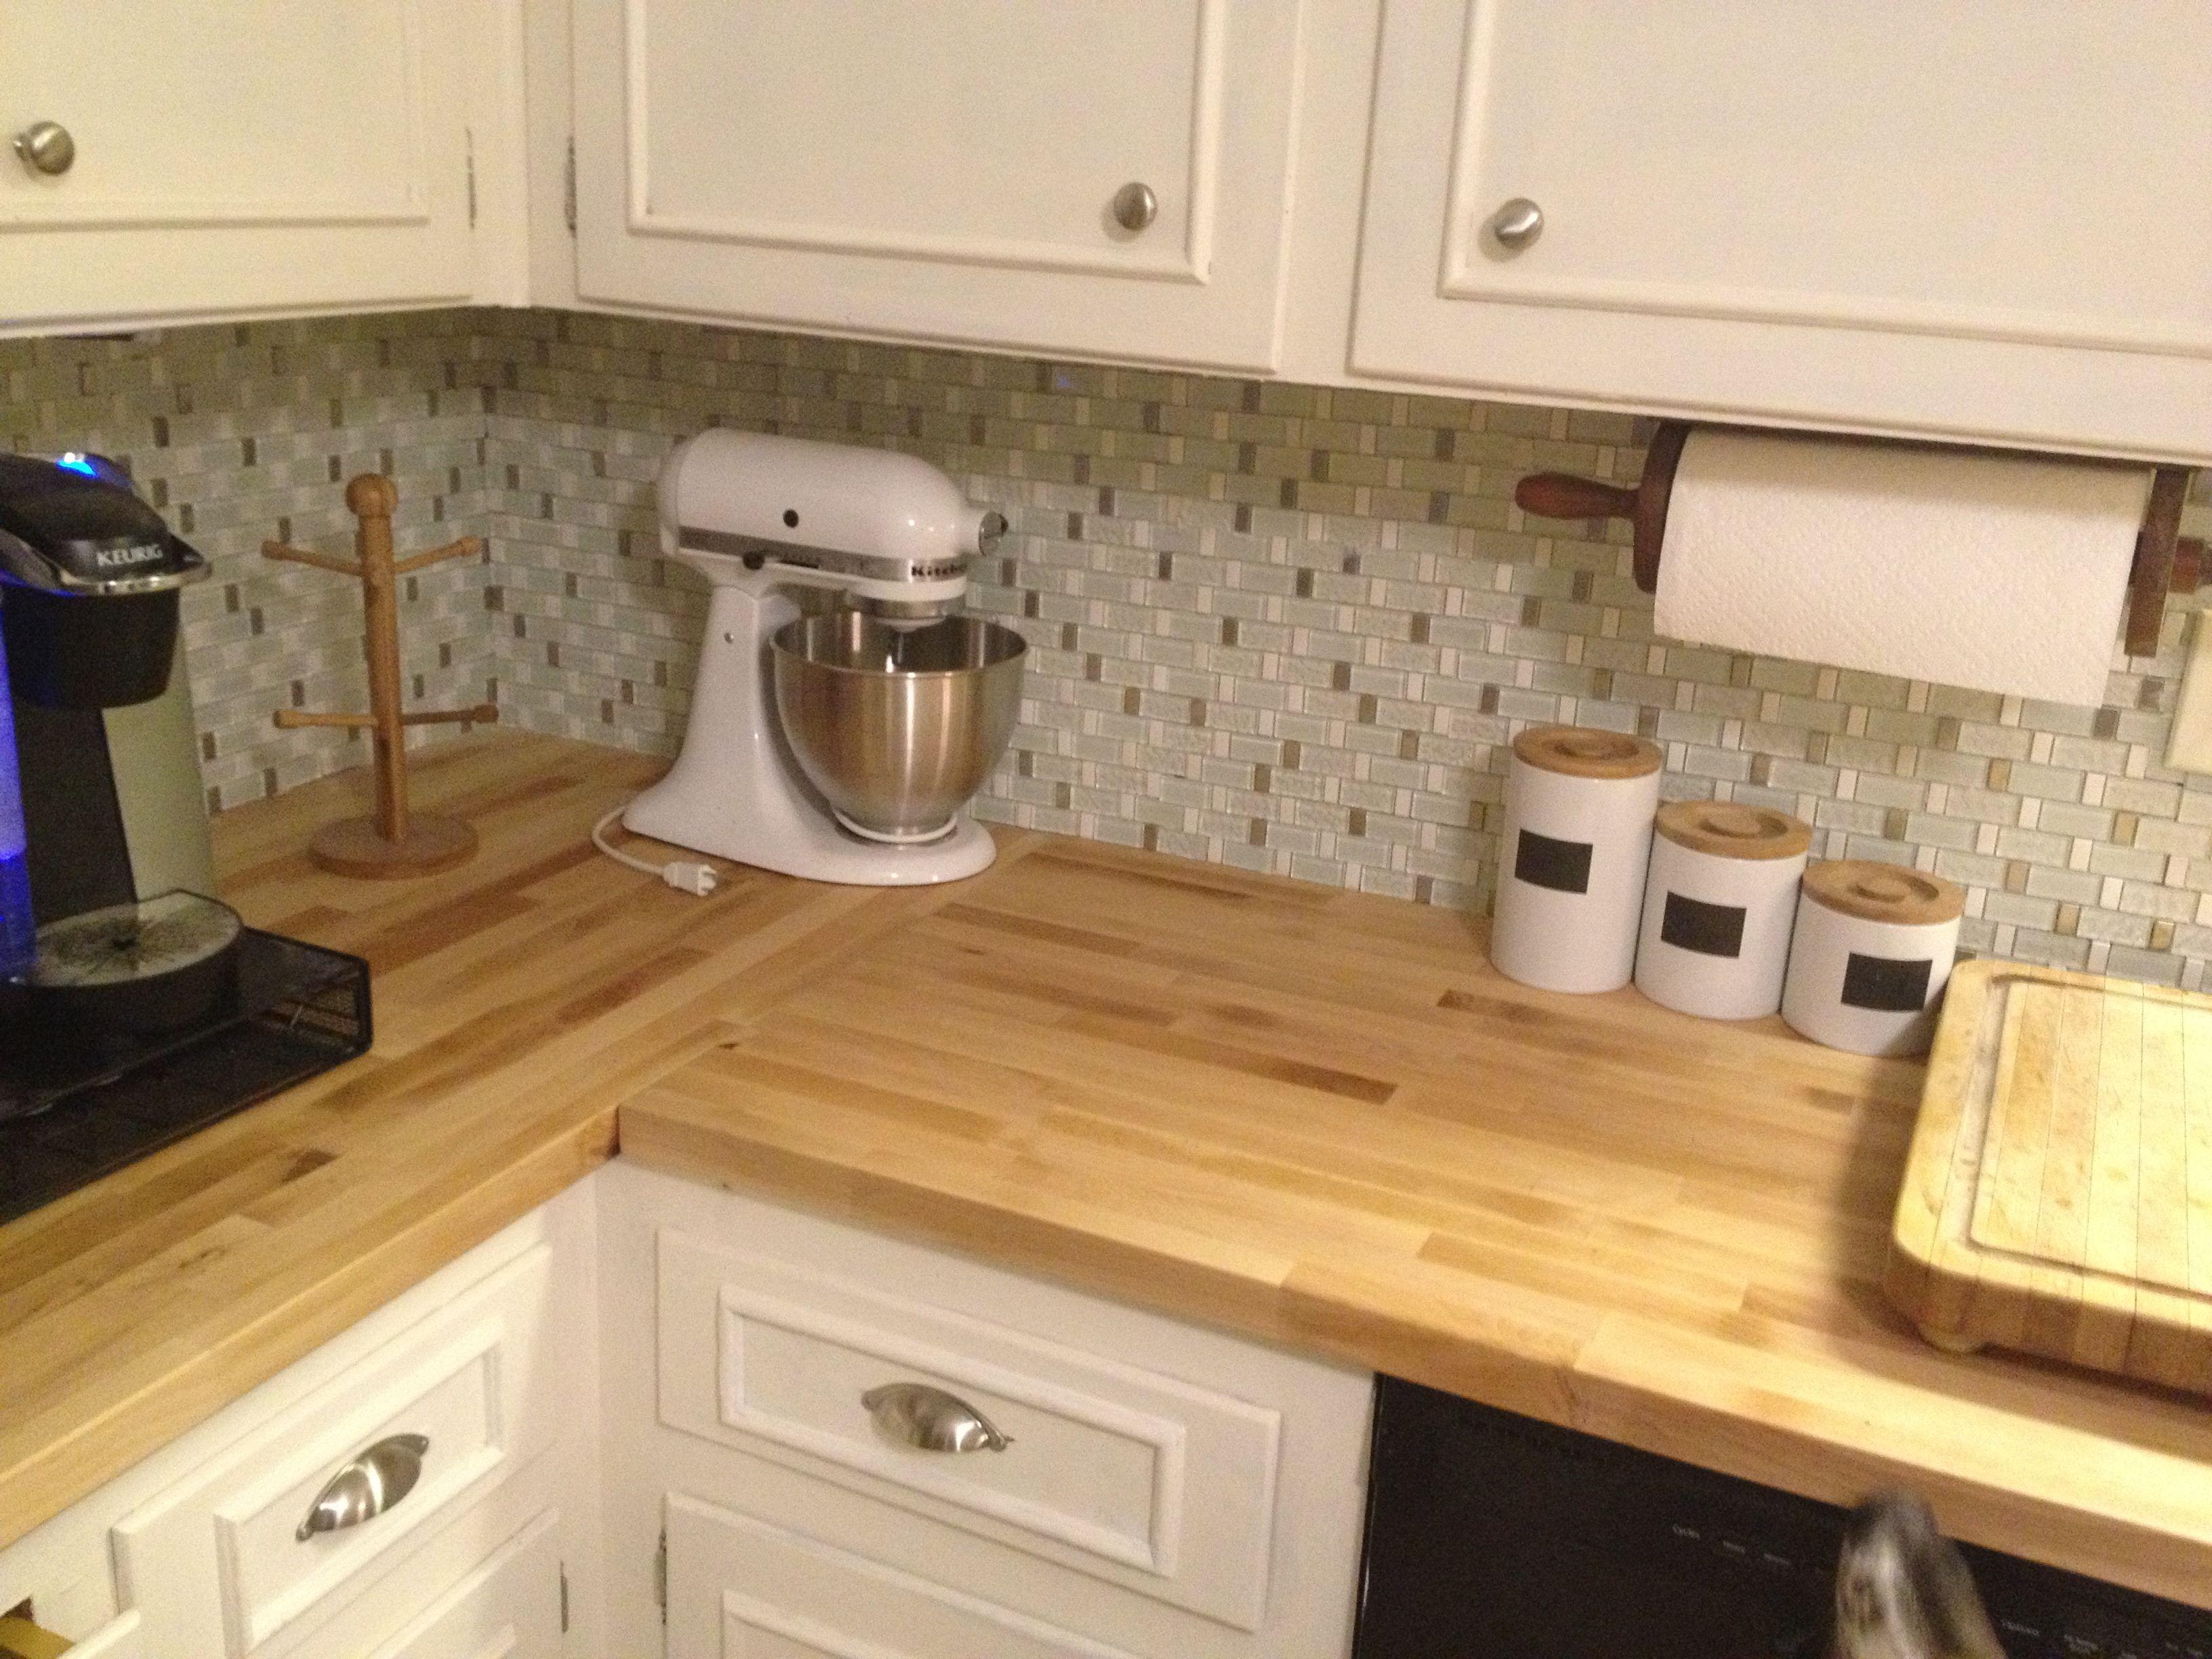 ikea kitchen countertops brass faucet countertop 300 dollars our house pinterest